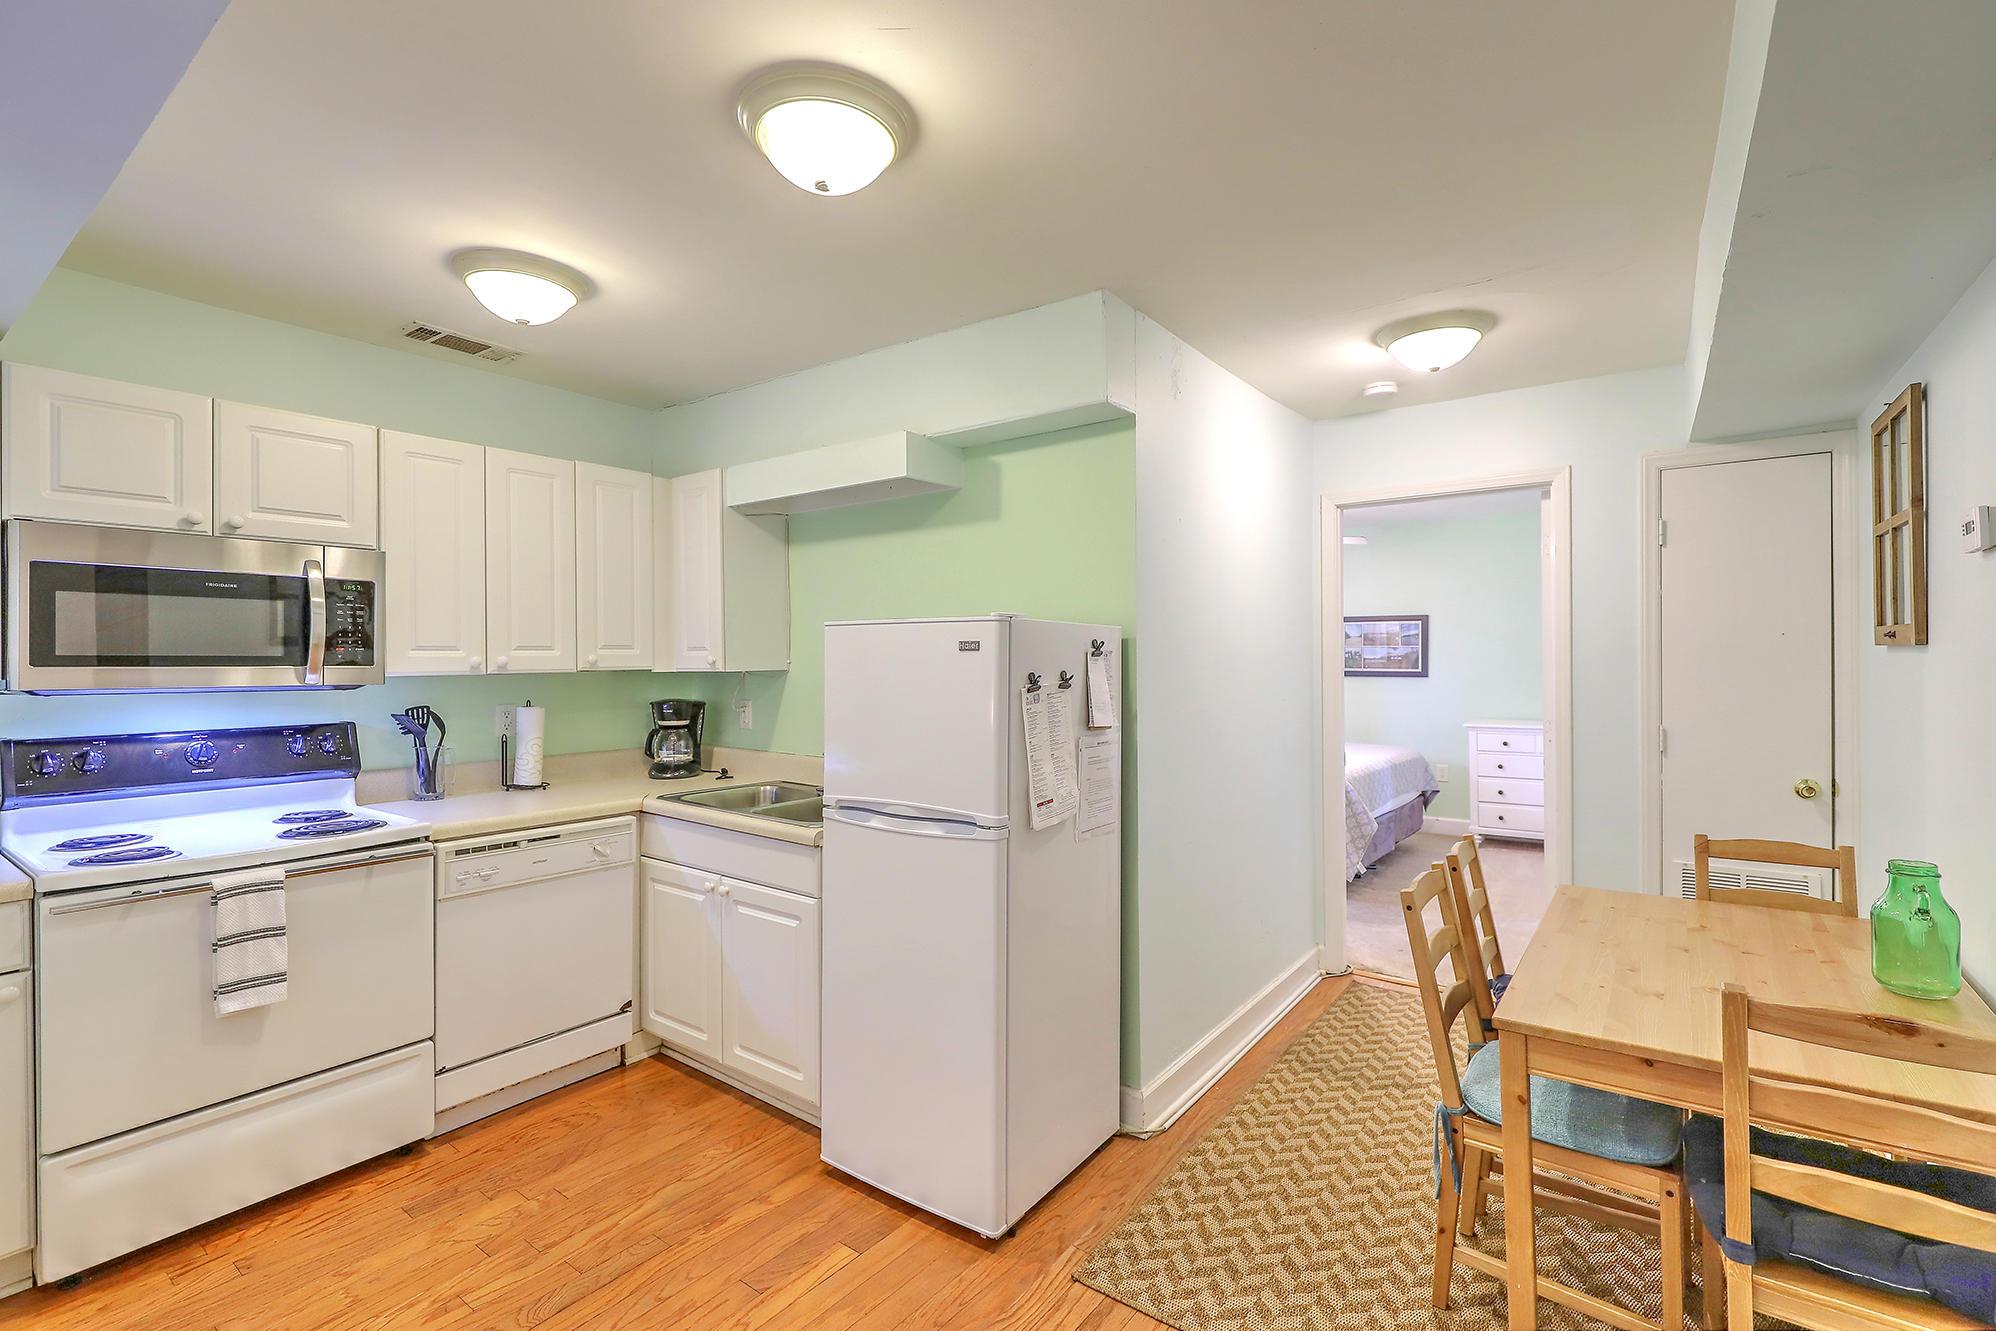 Marsh Grass Condominiums Homes For Sale - 1501 Ben Sawyer, Mount Pleasant, SC - 13